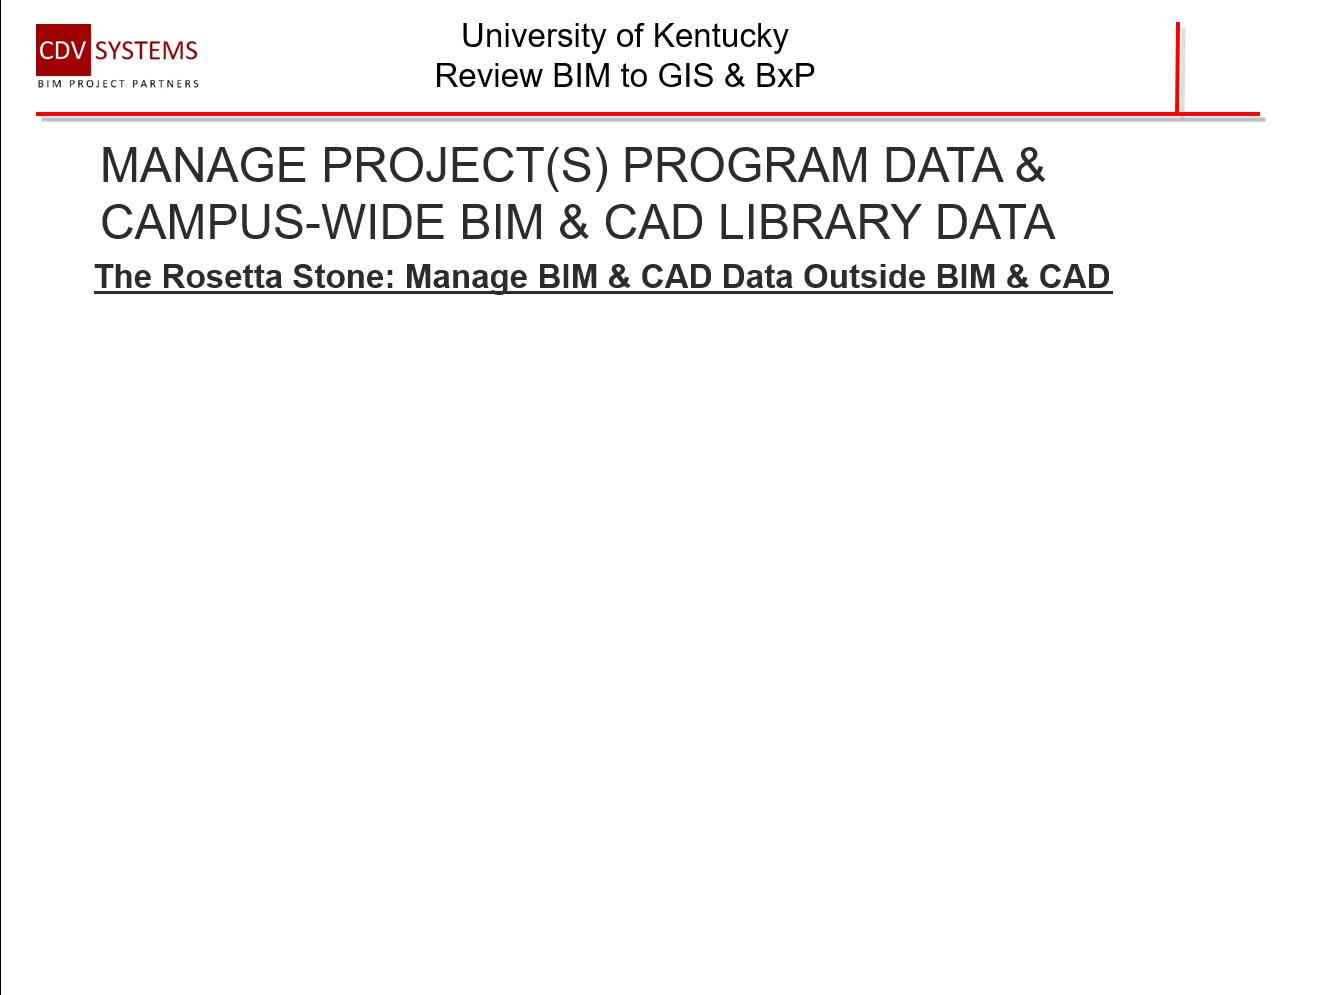 University of Kentucky_001x.jpg